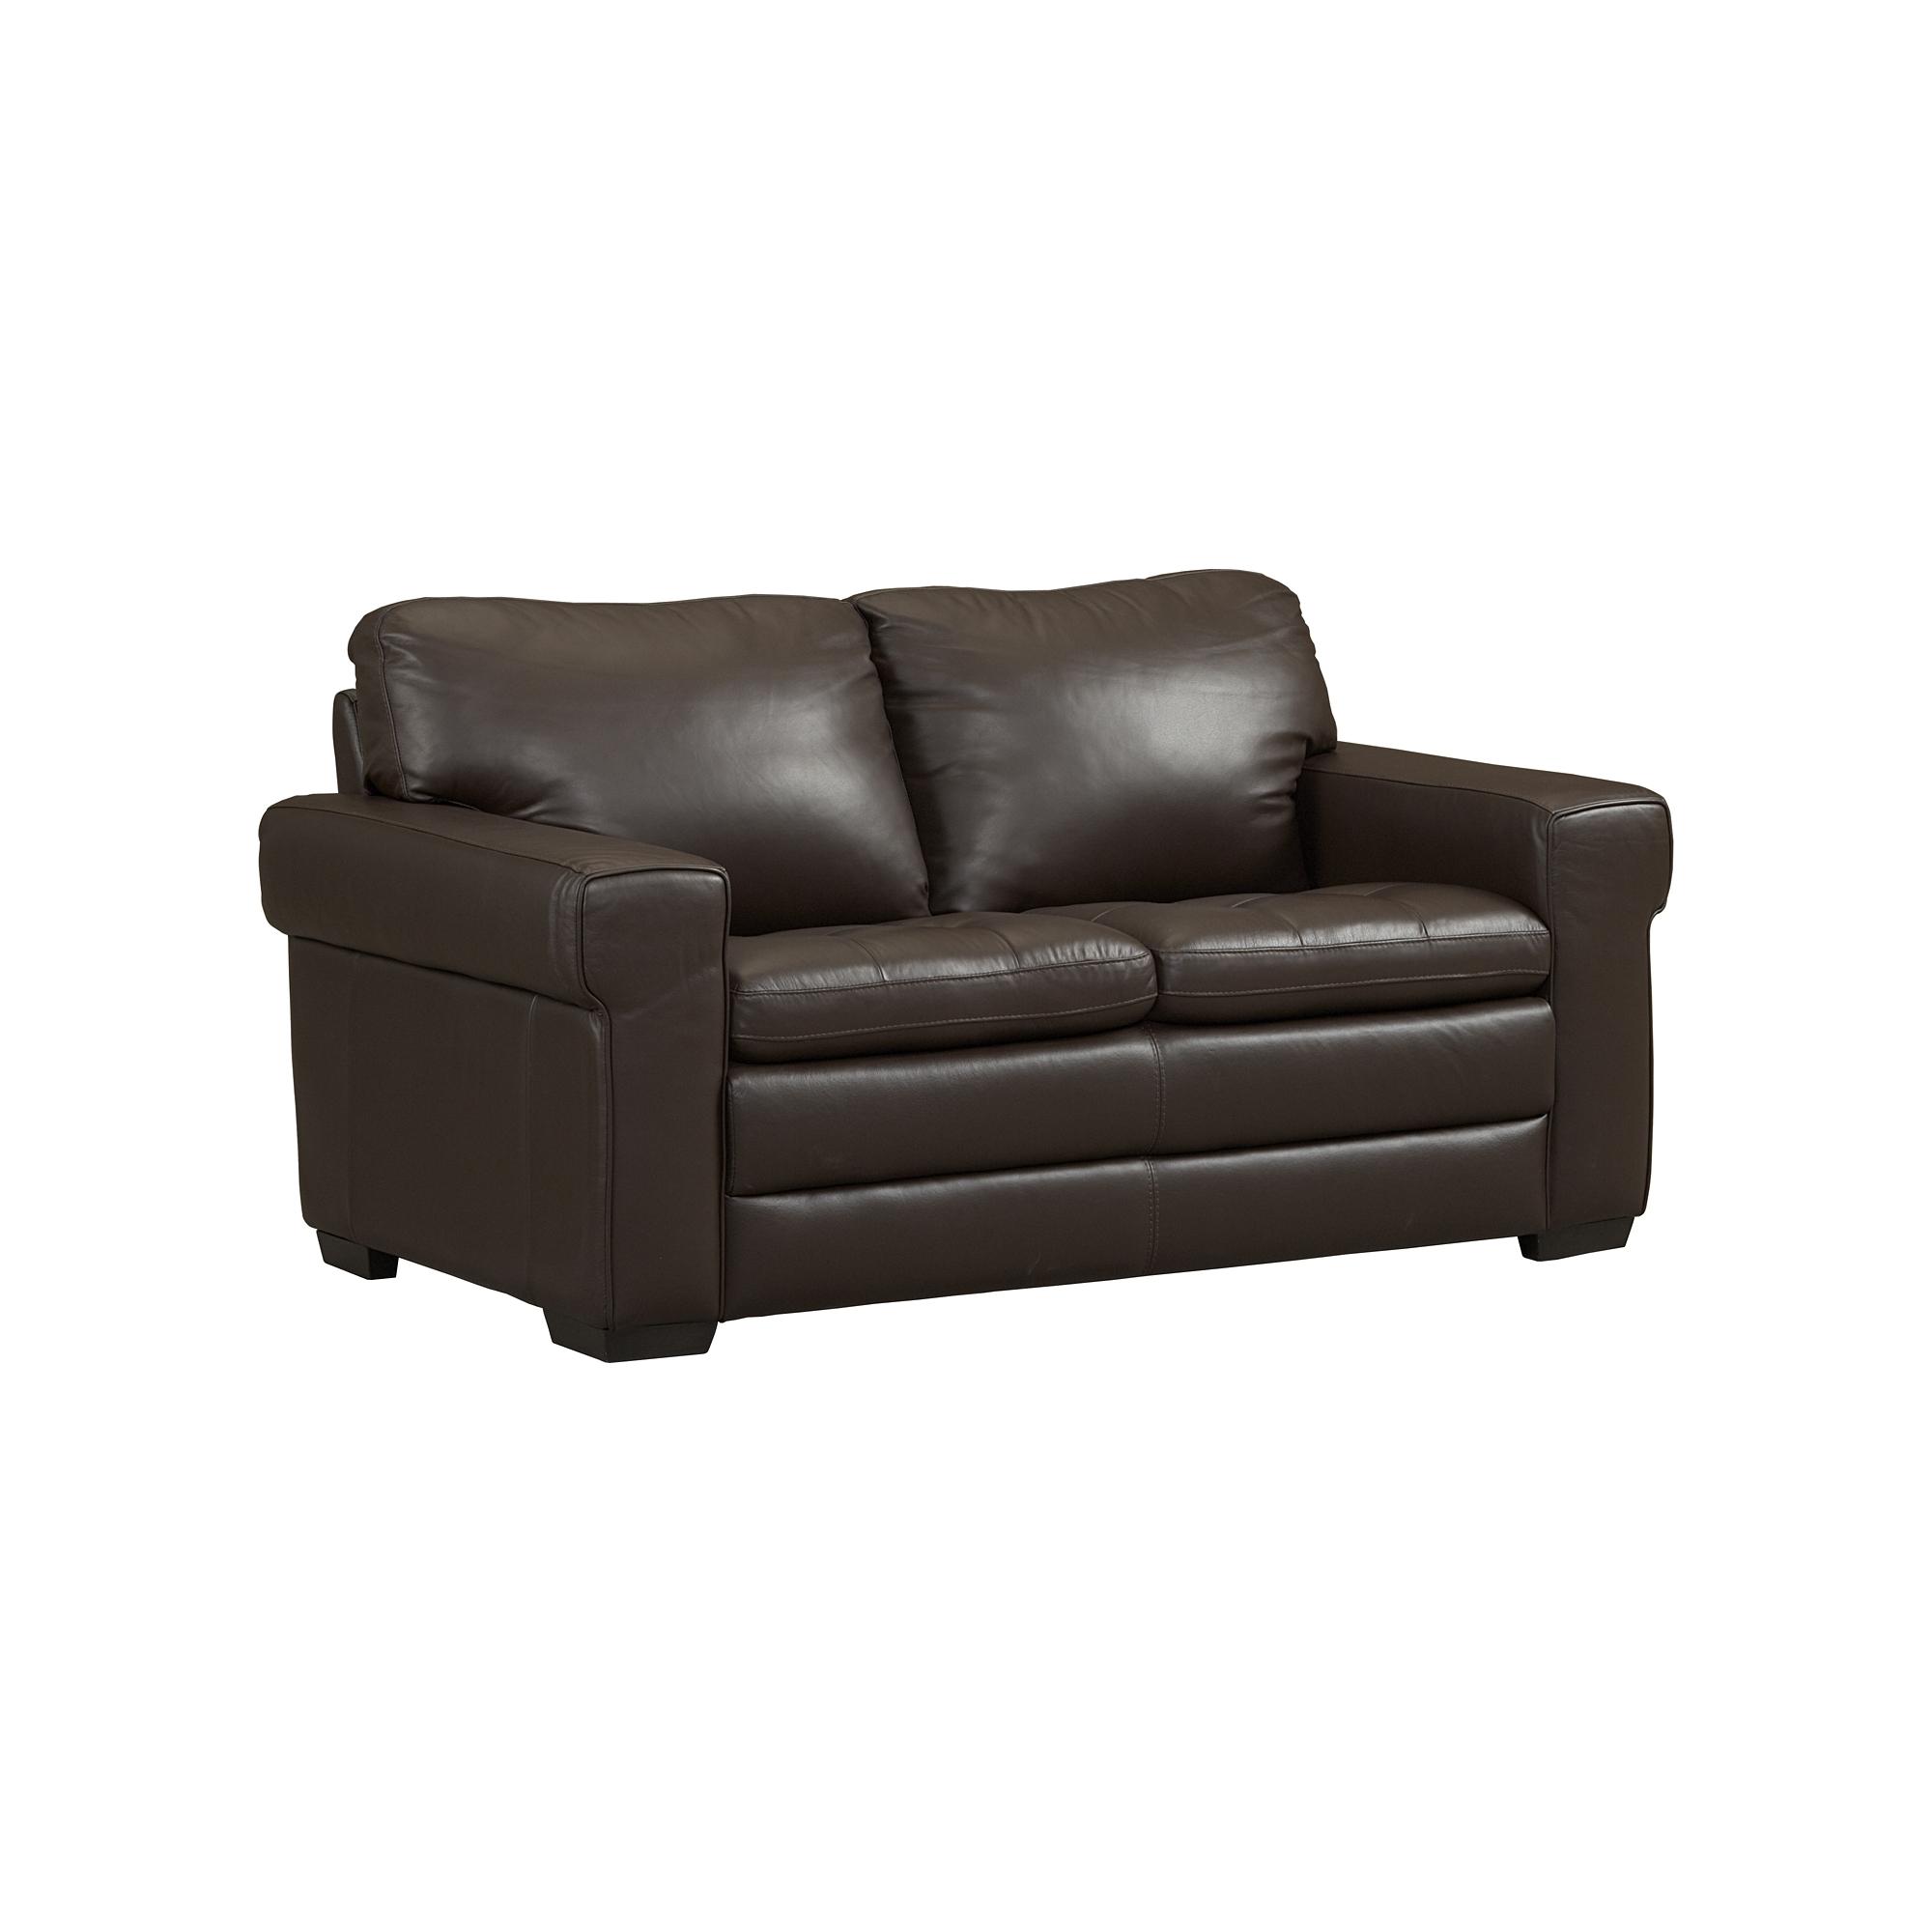 Havertys sofas and loveseats sofa ideas for Loveseat sofa